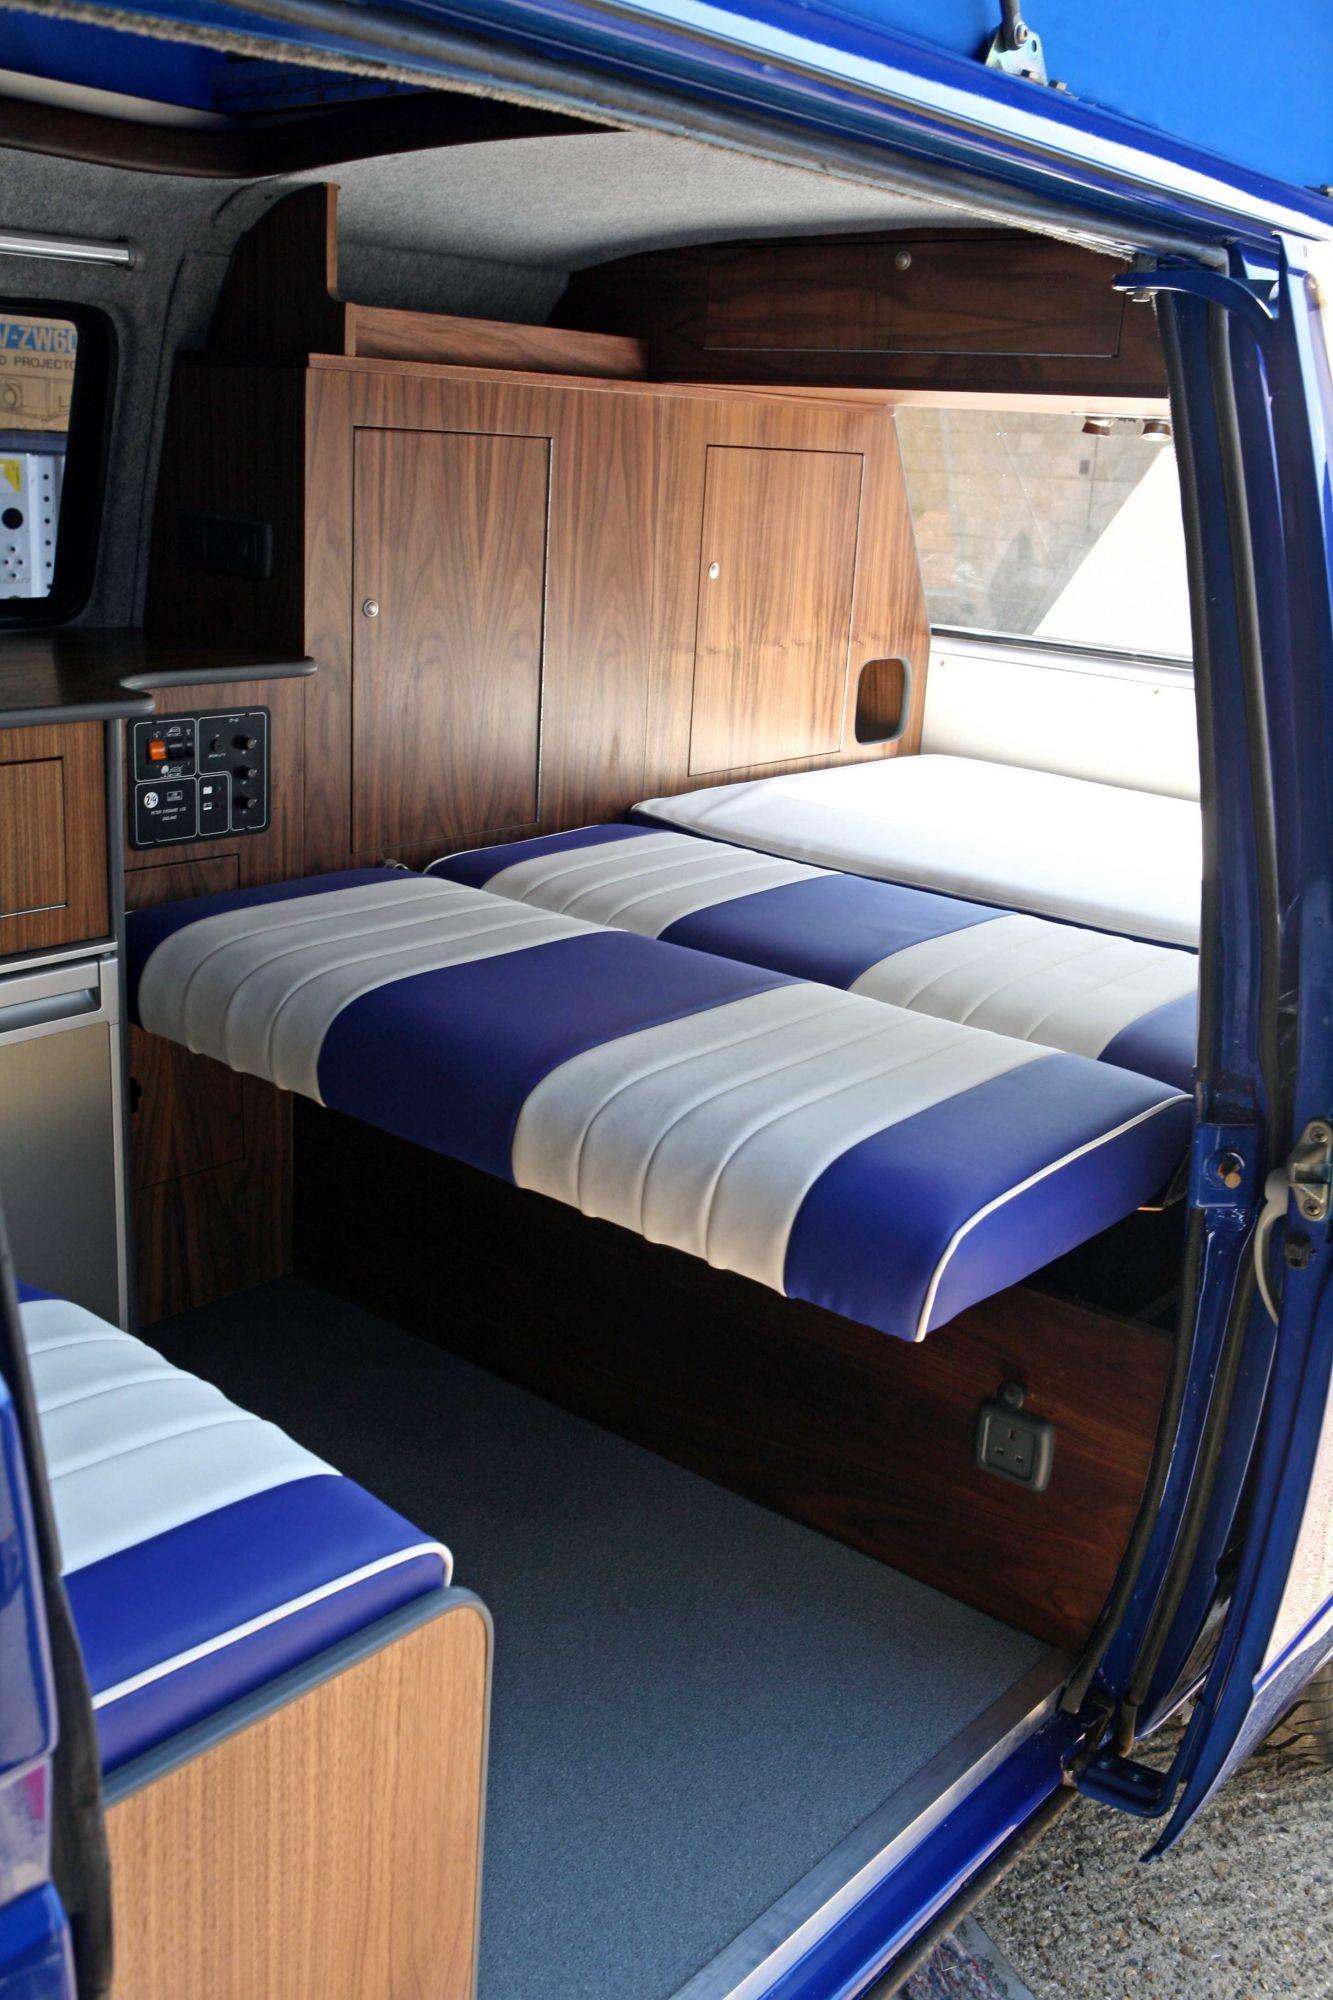 coastline interiors for t25 and t3 vw bus camper ausbauten pinterest kombis sch ne m bel. Black Bedroom Furniture Sets. Home Design Ideas